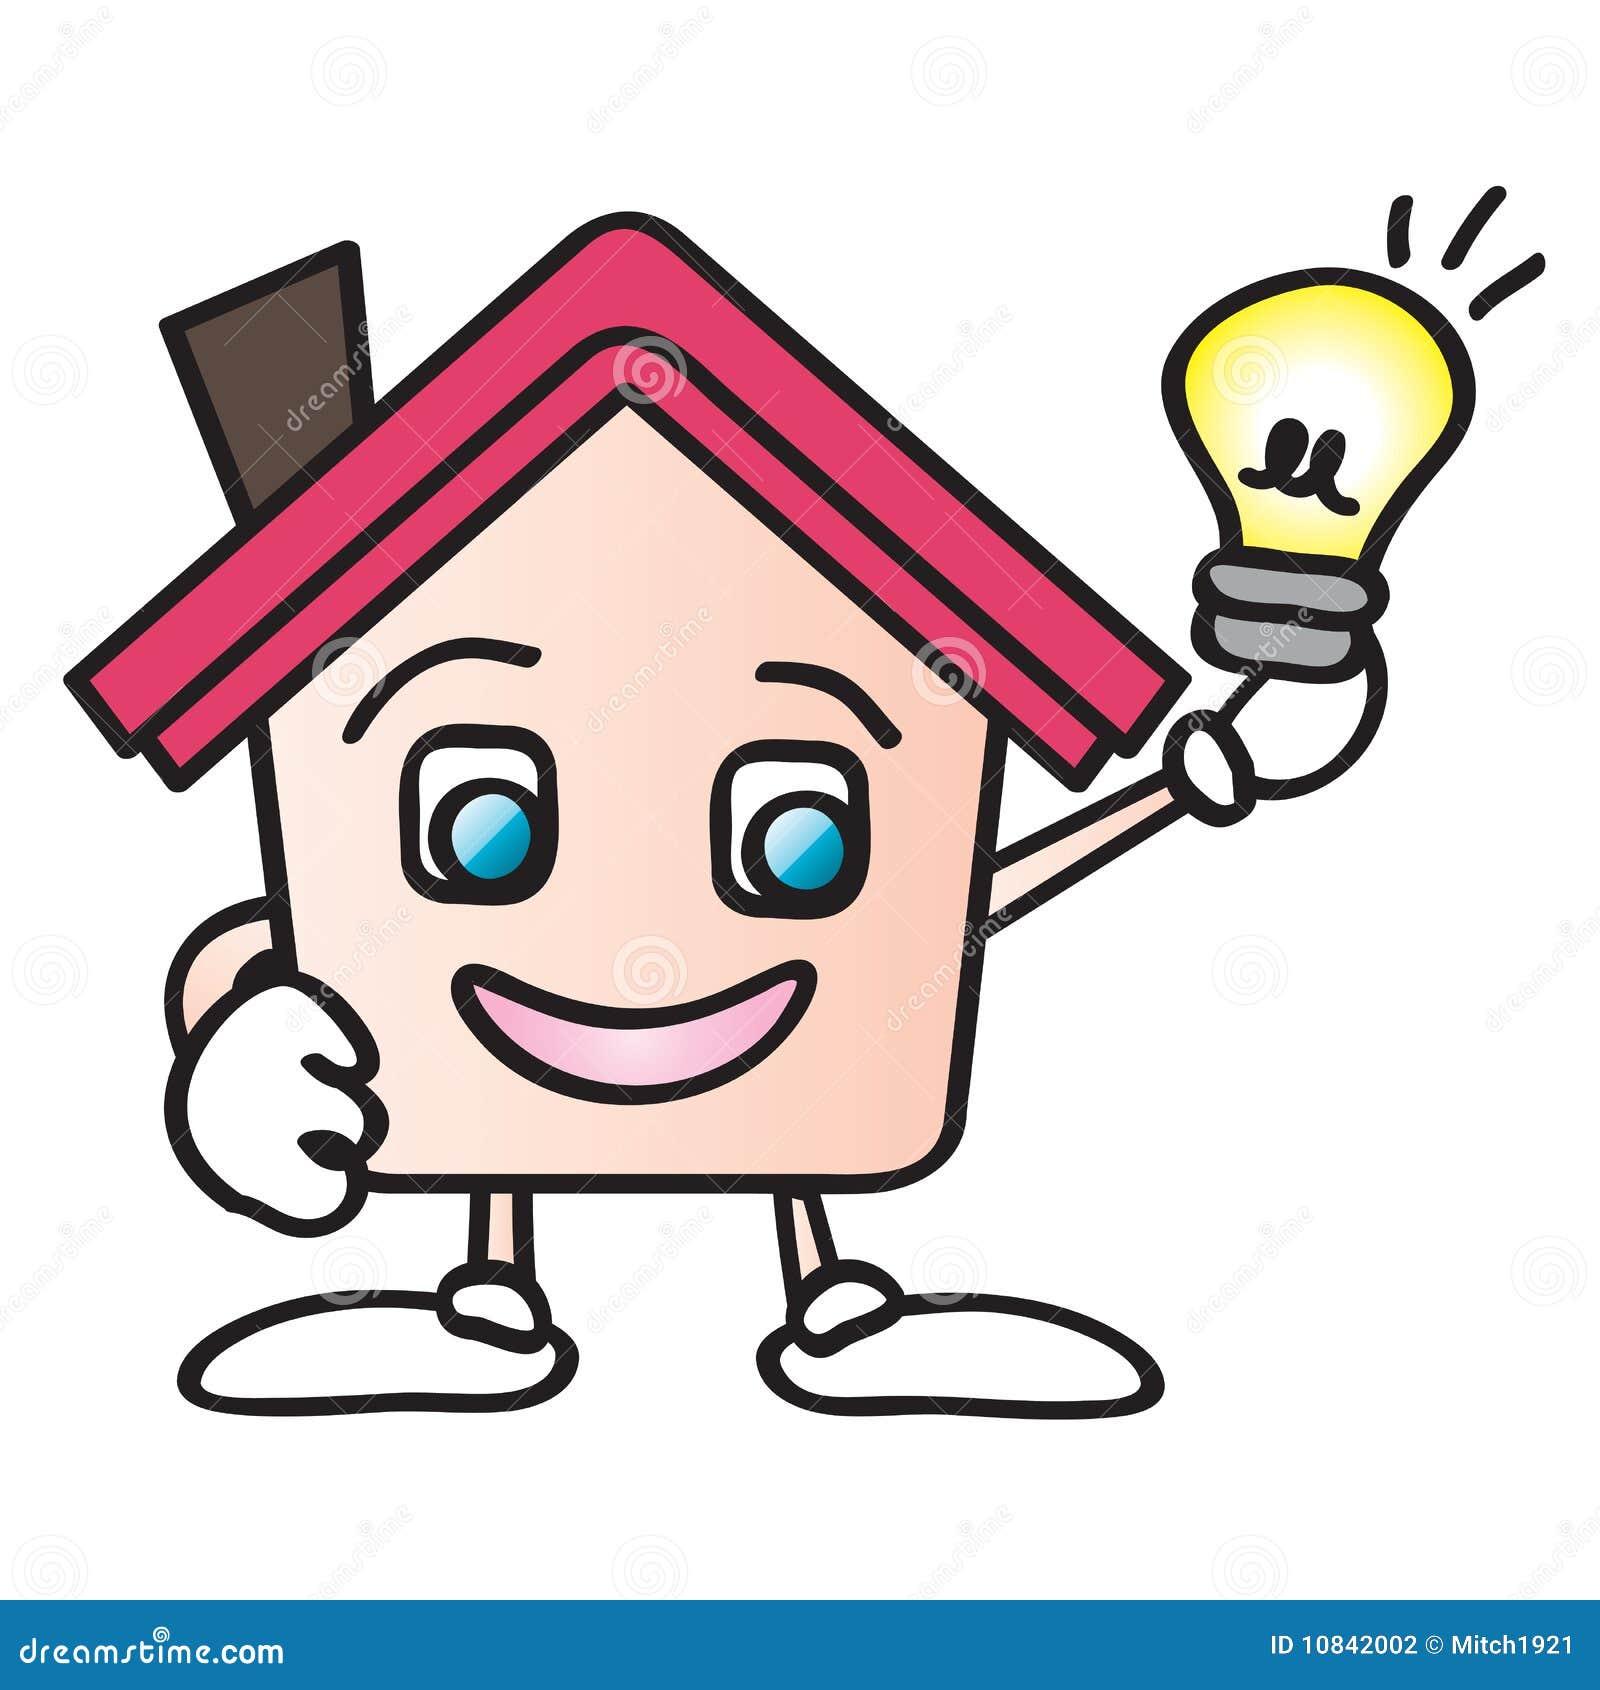 House Energy Cartoon Stock Vector Image Of Bright Green